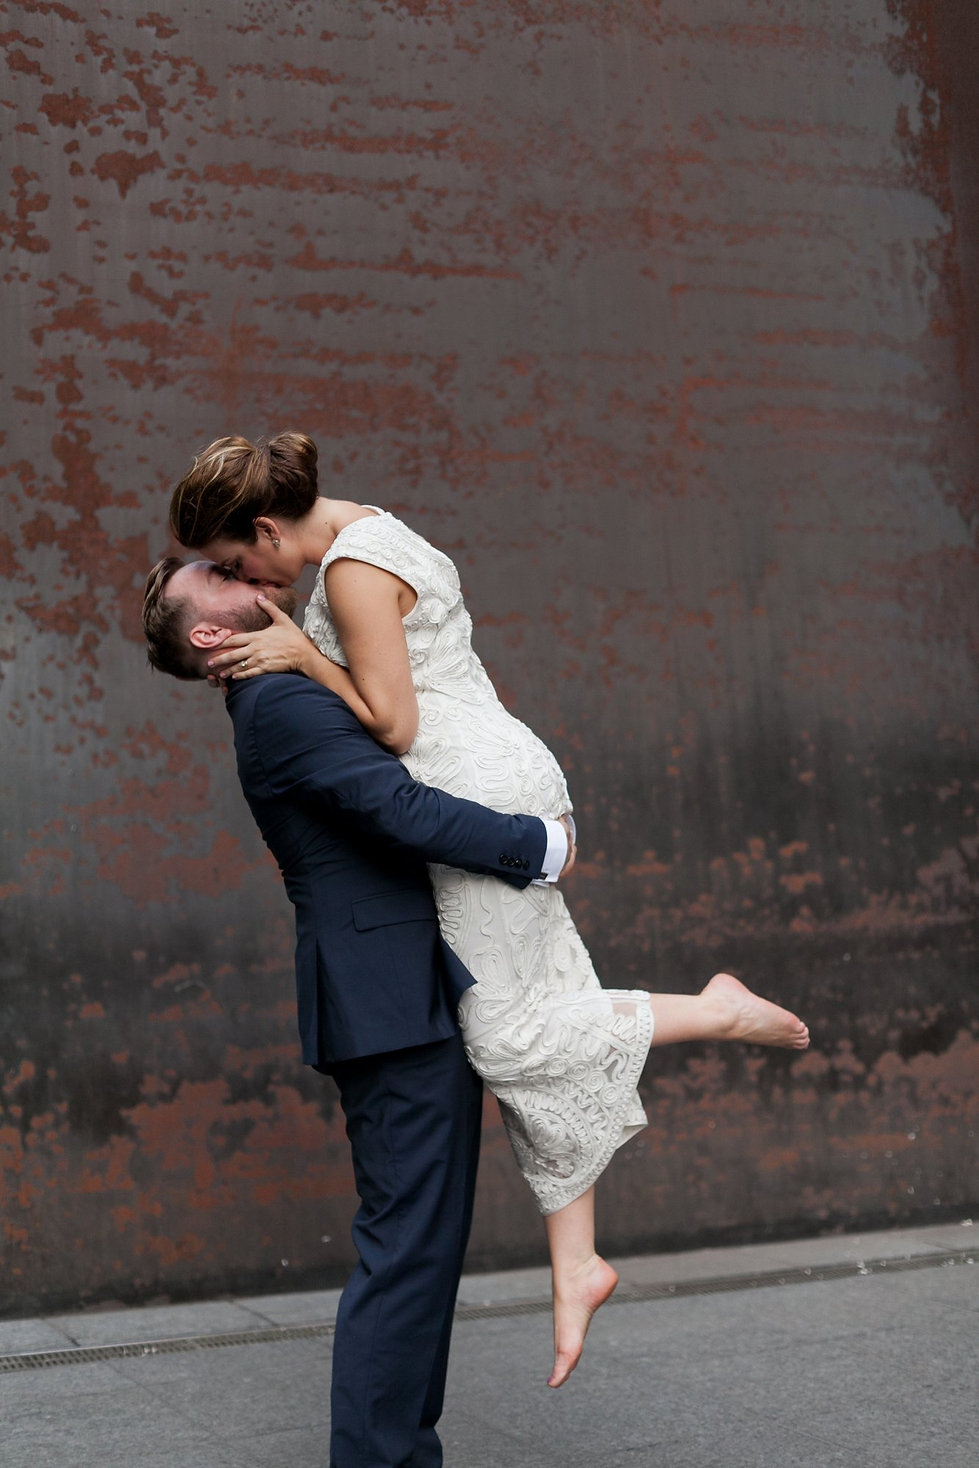 Liverpool street wedding photoshoot